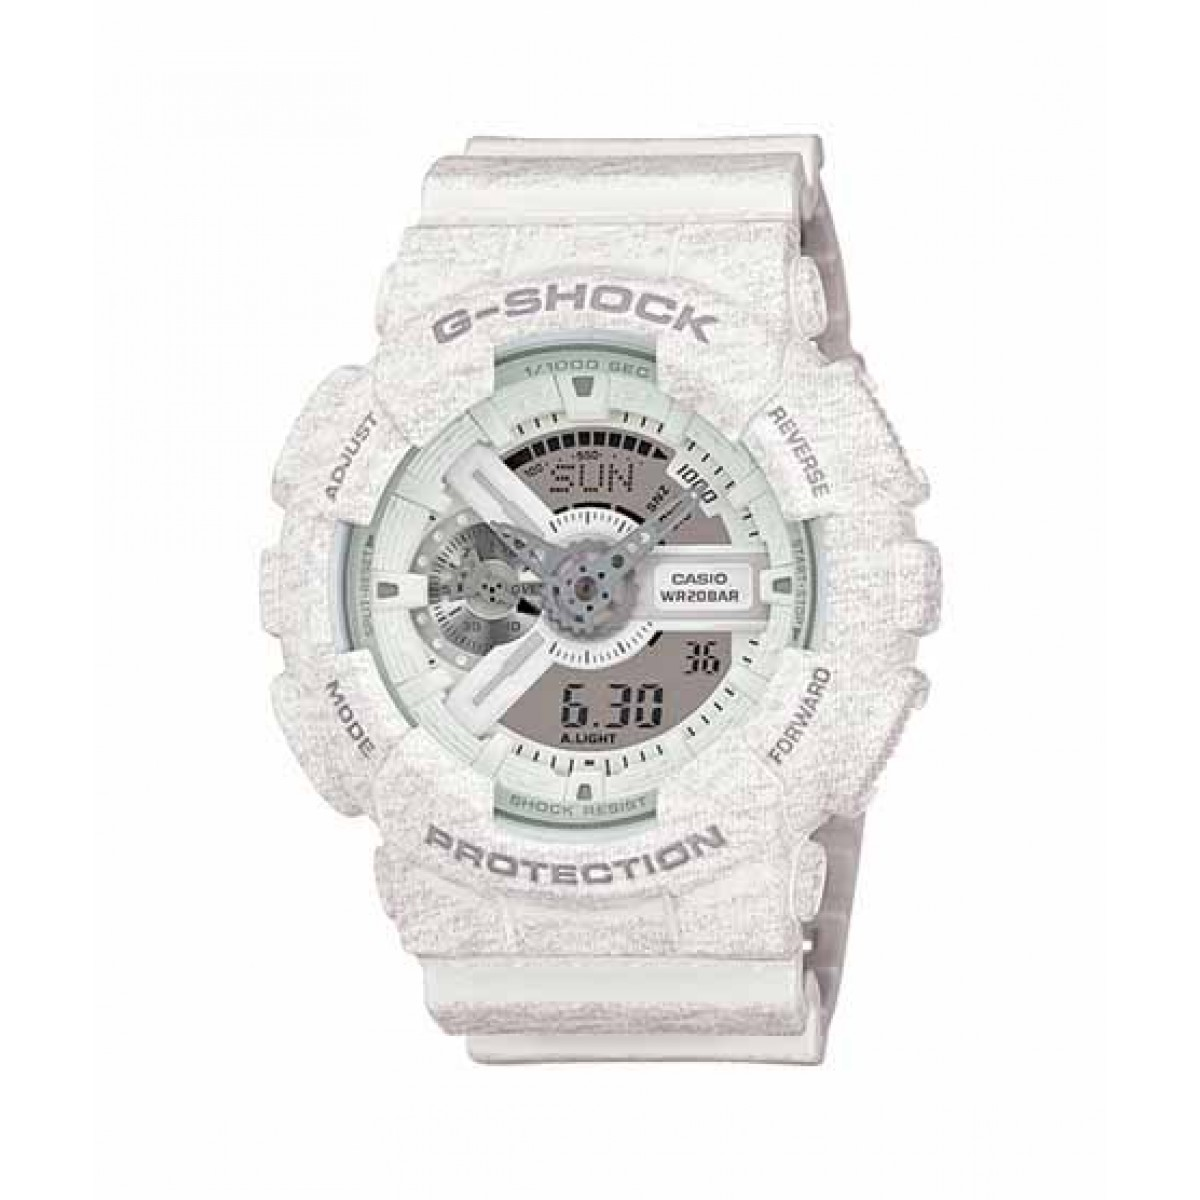 Casio G-Shock Men's Watch (GA110HT-7A)